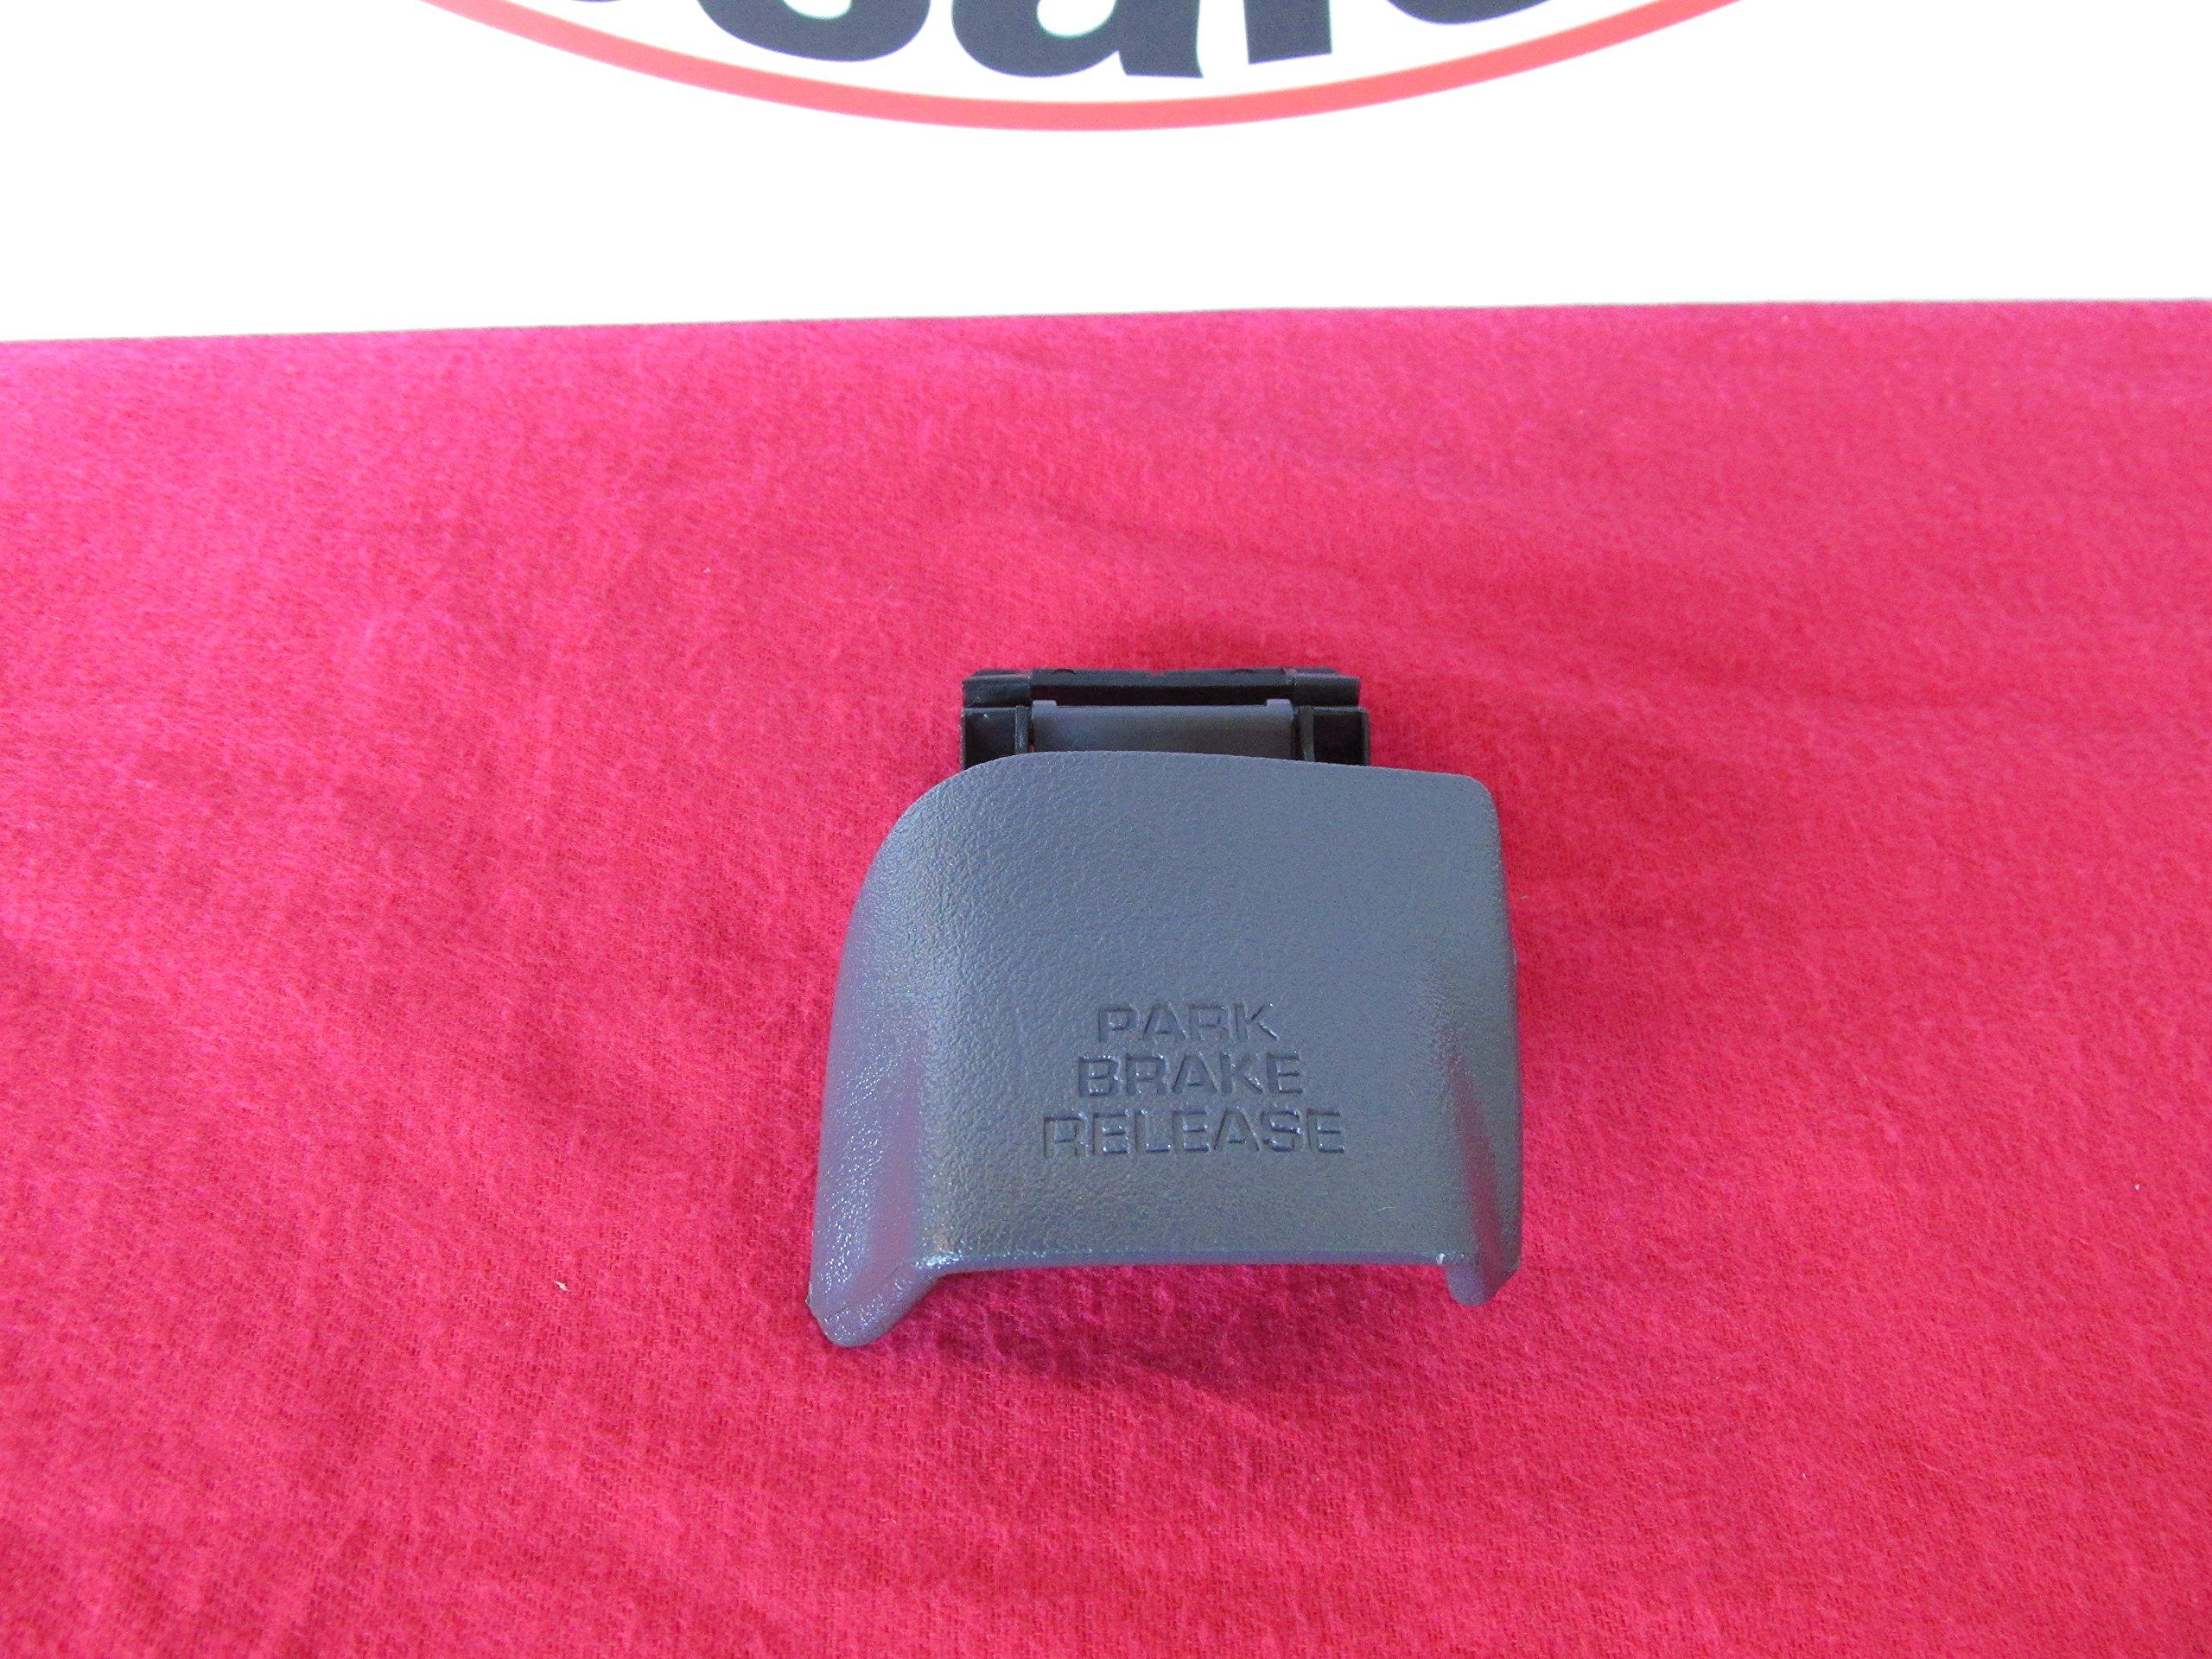 DODGE RAM 1500 2500 3500 Mist Gray Parking brake pull handle NEW OEM MOPAR by Mopar